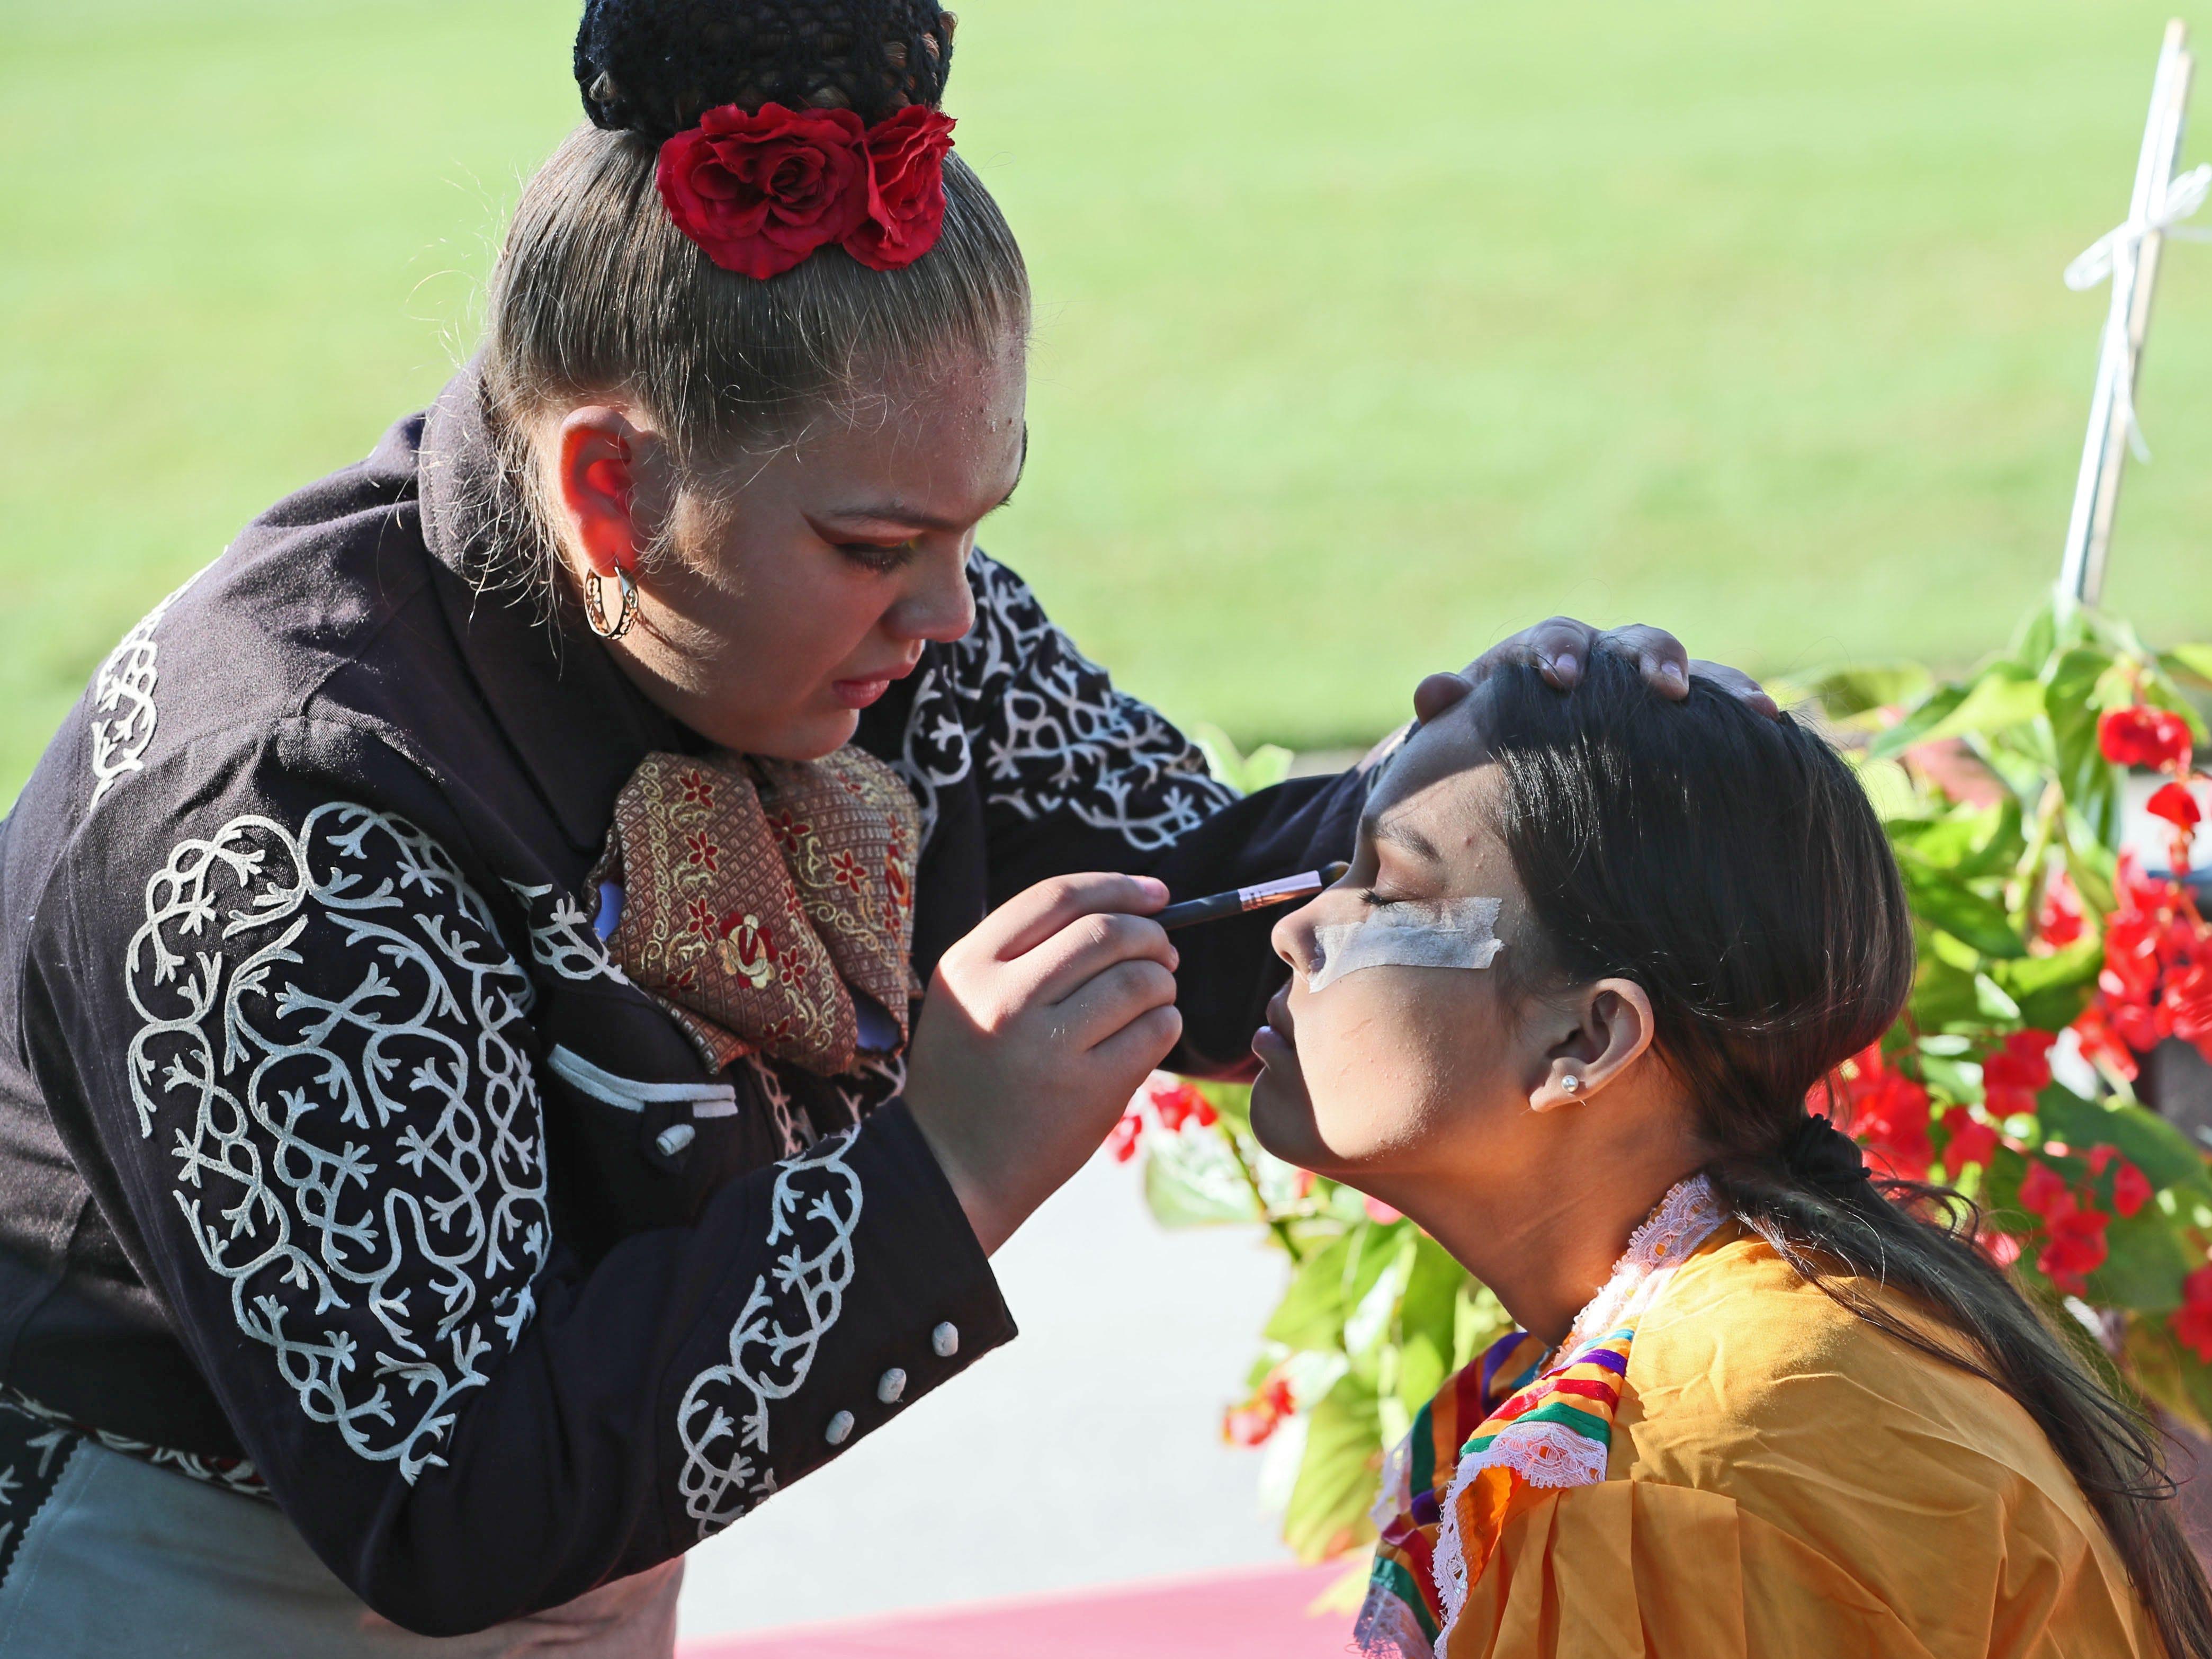 Alexandra Zuniga puts makeup on Yuritzia Gaona before the parade. Both are students at Morgandale School.